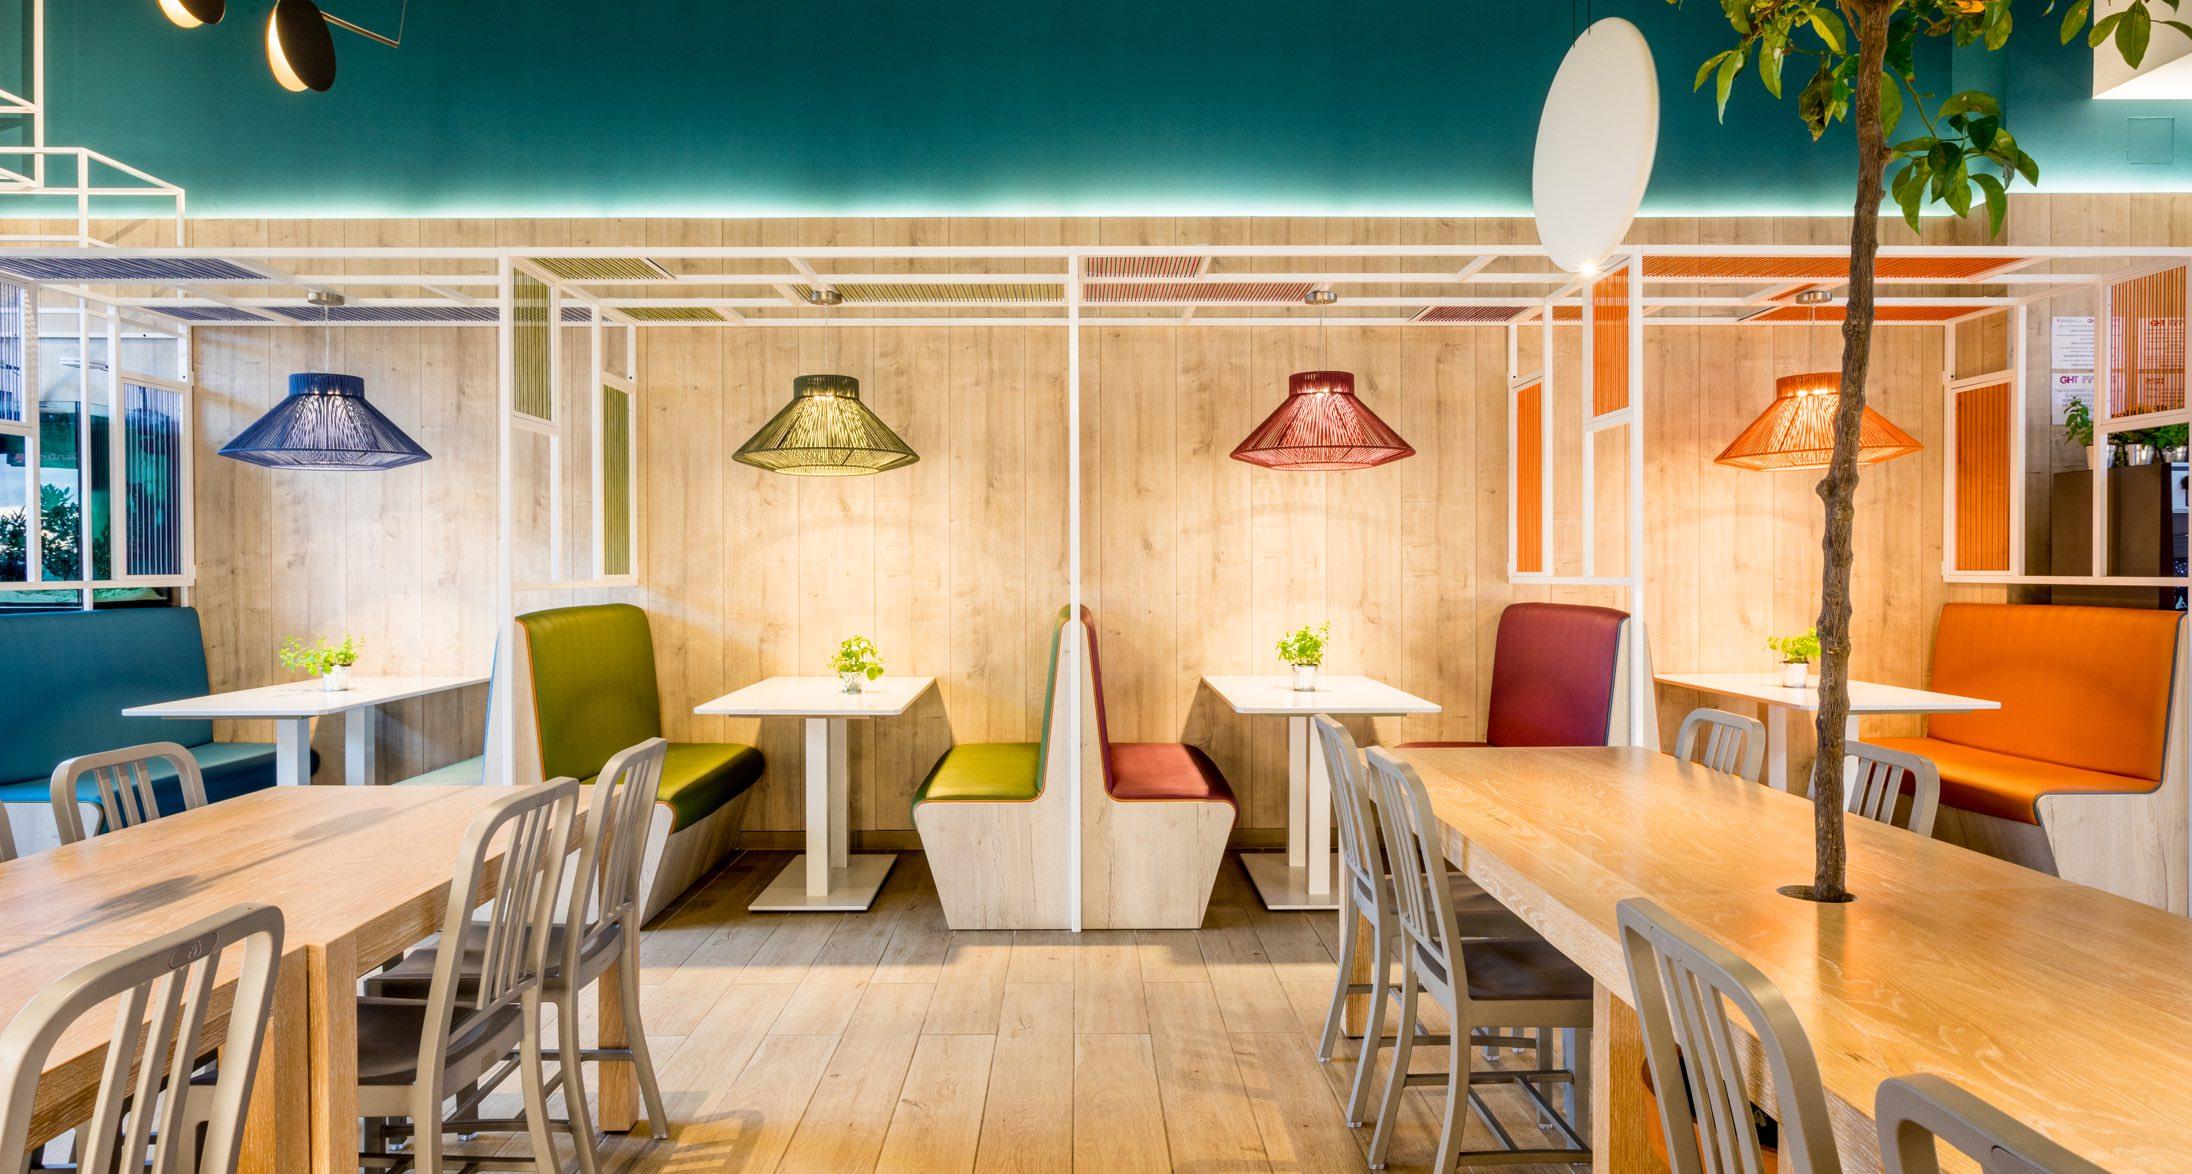 Atlantida Restaurant Mataro Parc diseño por Rosa Colet Interior